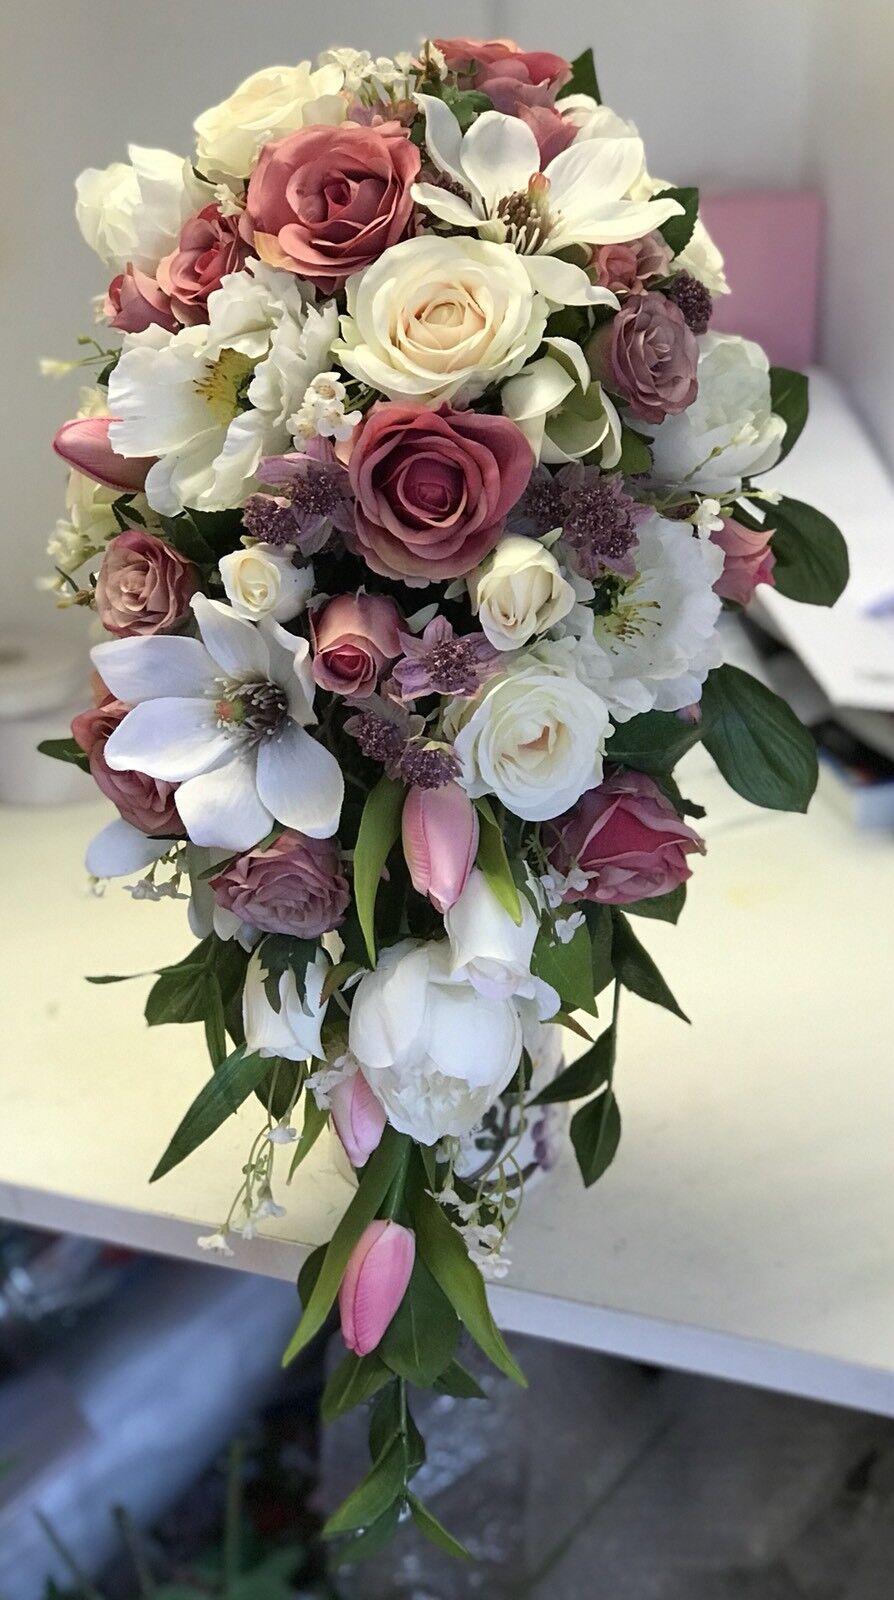 Grand Mariage Mariage Grand Bouquet, Mariée, Vintage Rose, Blanc, Rose Crème & PIVOINE Display 52b776